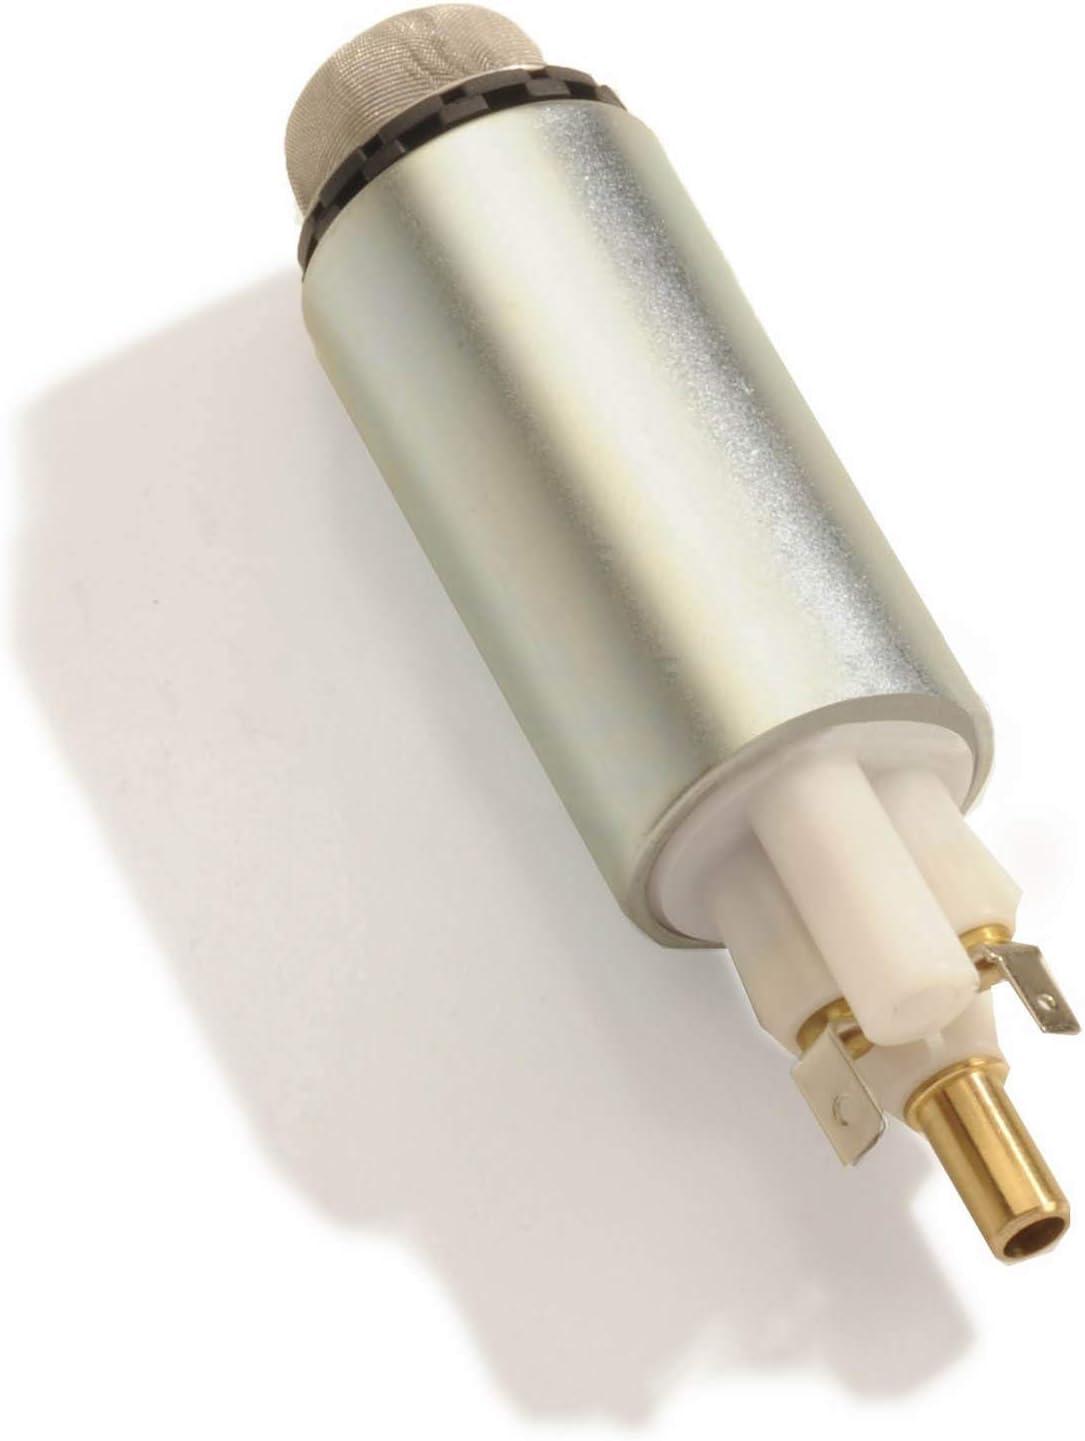 New Low Pressure Lift Fuel Pump For Mercury Verado Quicksilver 4// 6cyl 880596T58